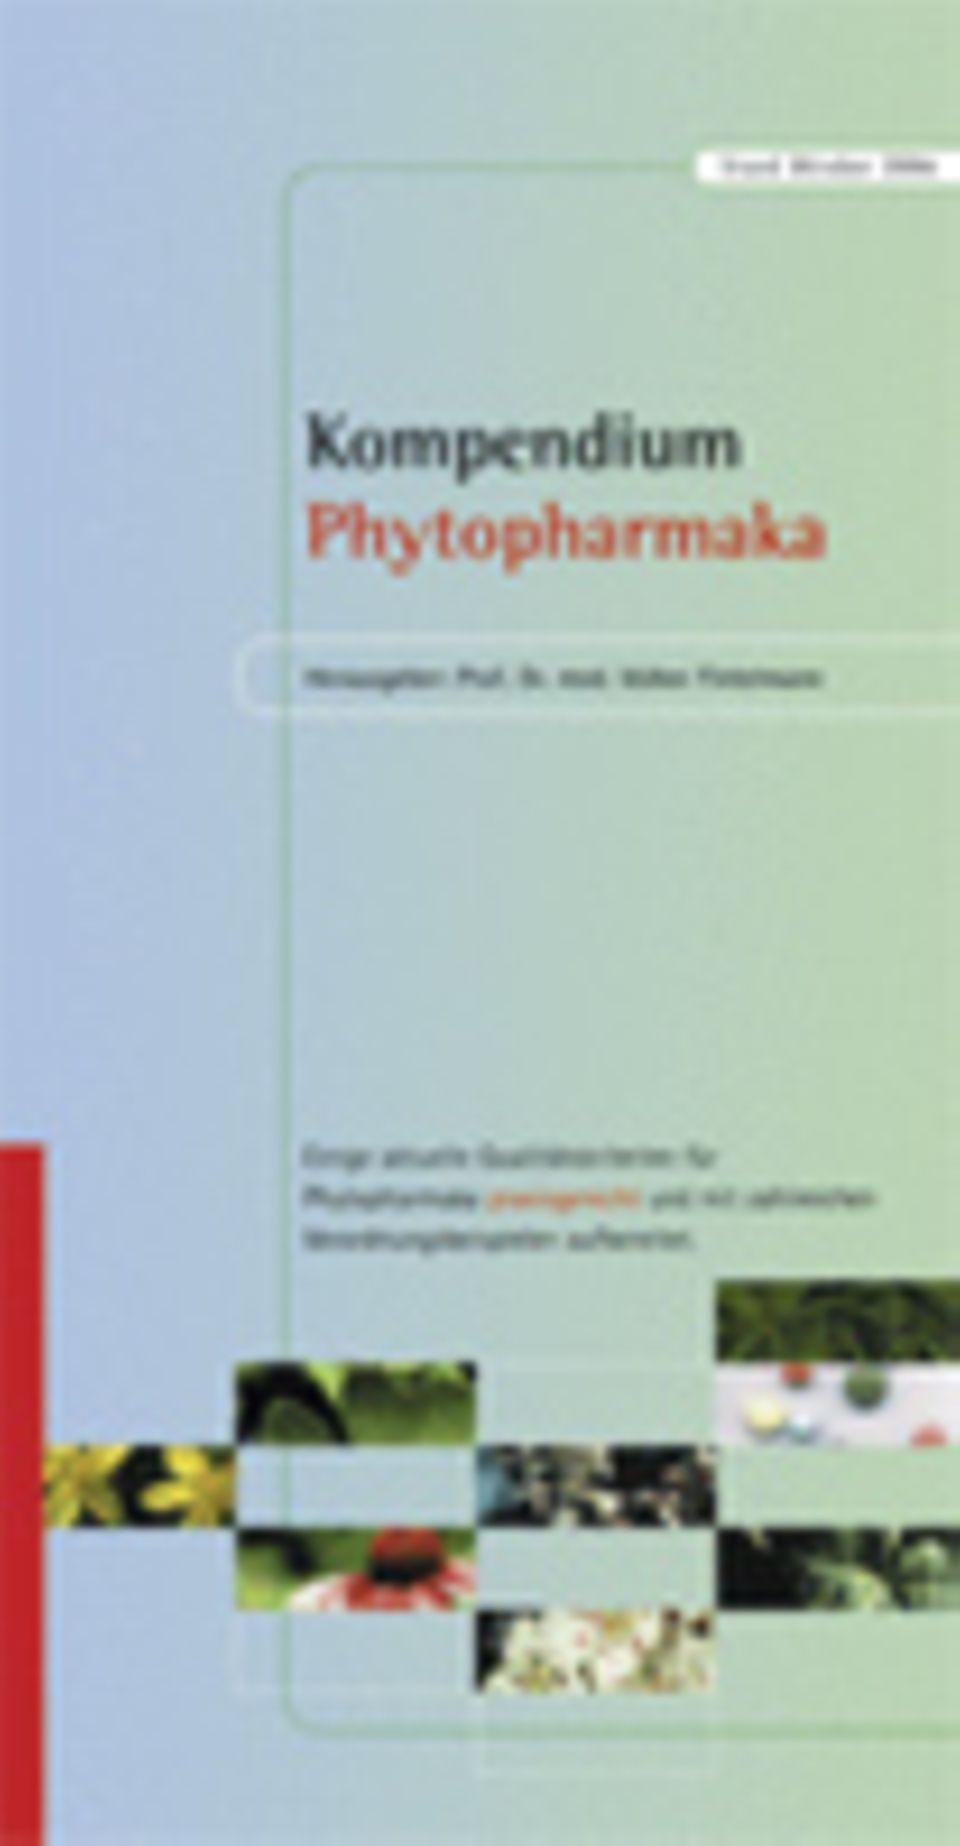 Aus: Kompendium Phytopharmaka (Kirchheim-Verlag)